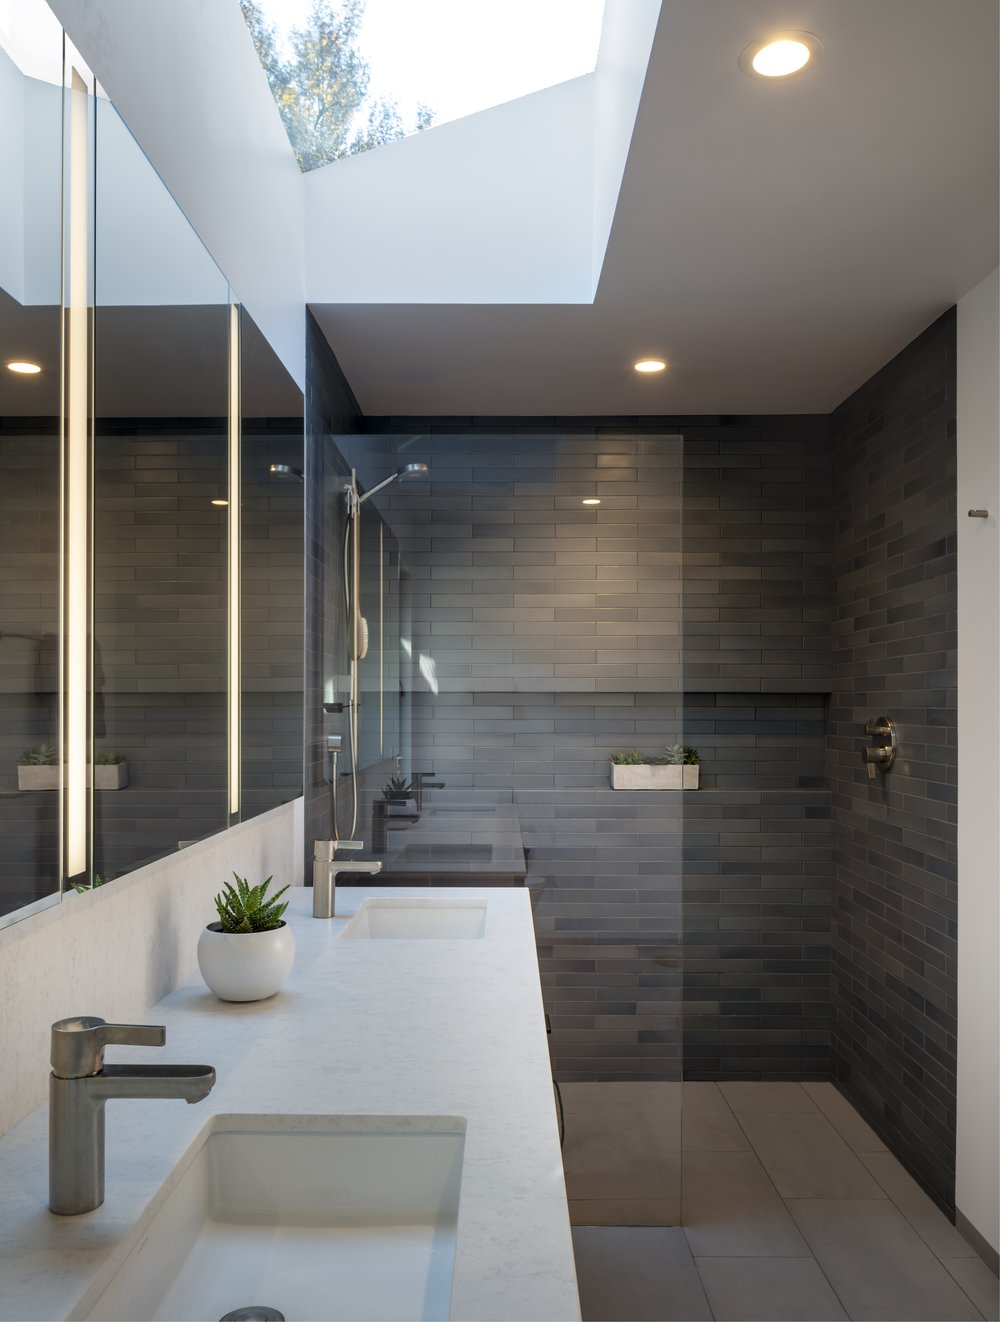 robsheal drive residence kitchen & bath